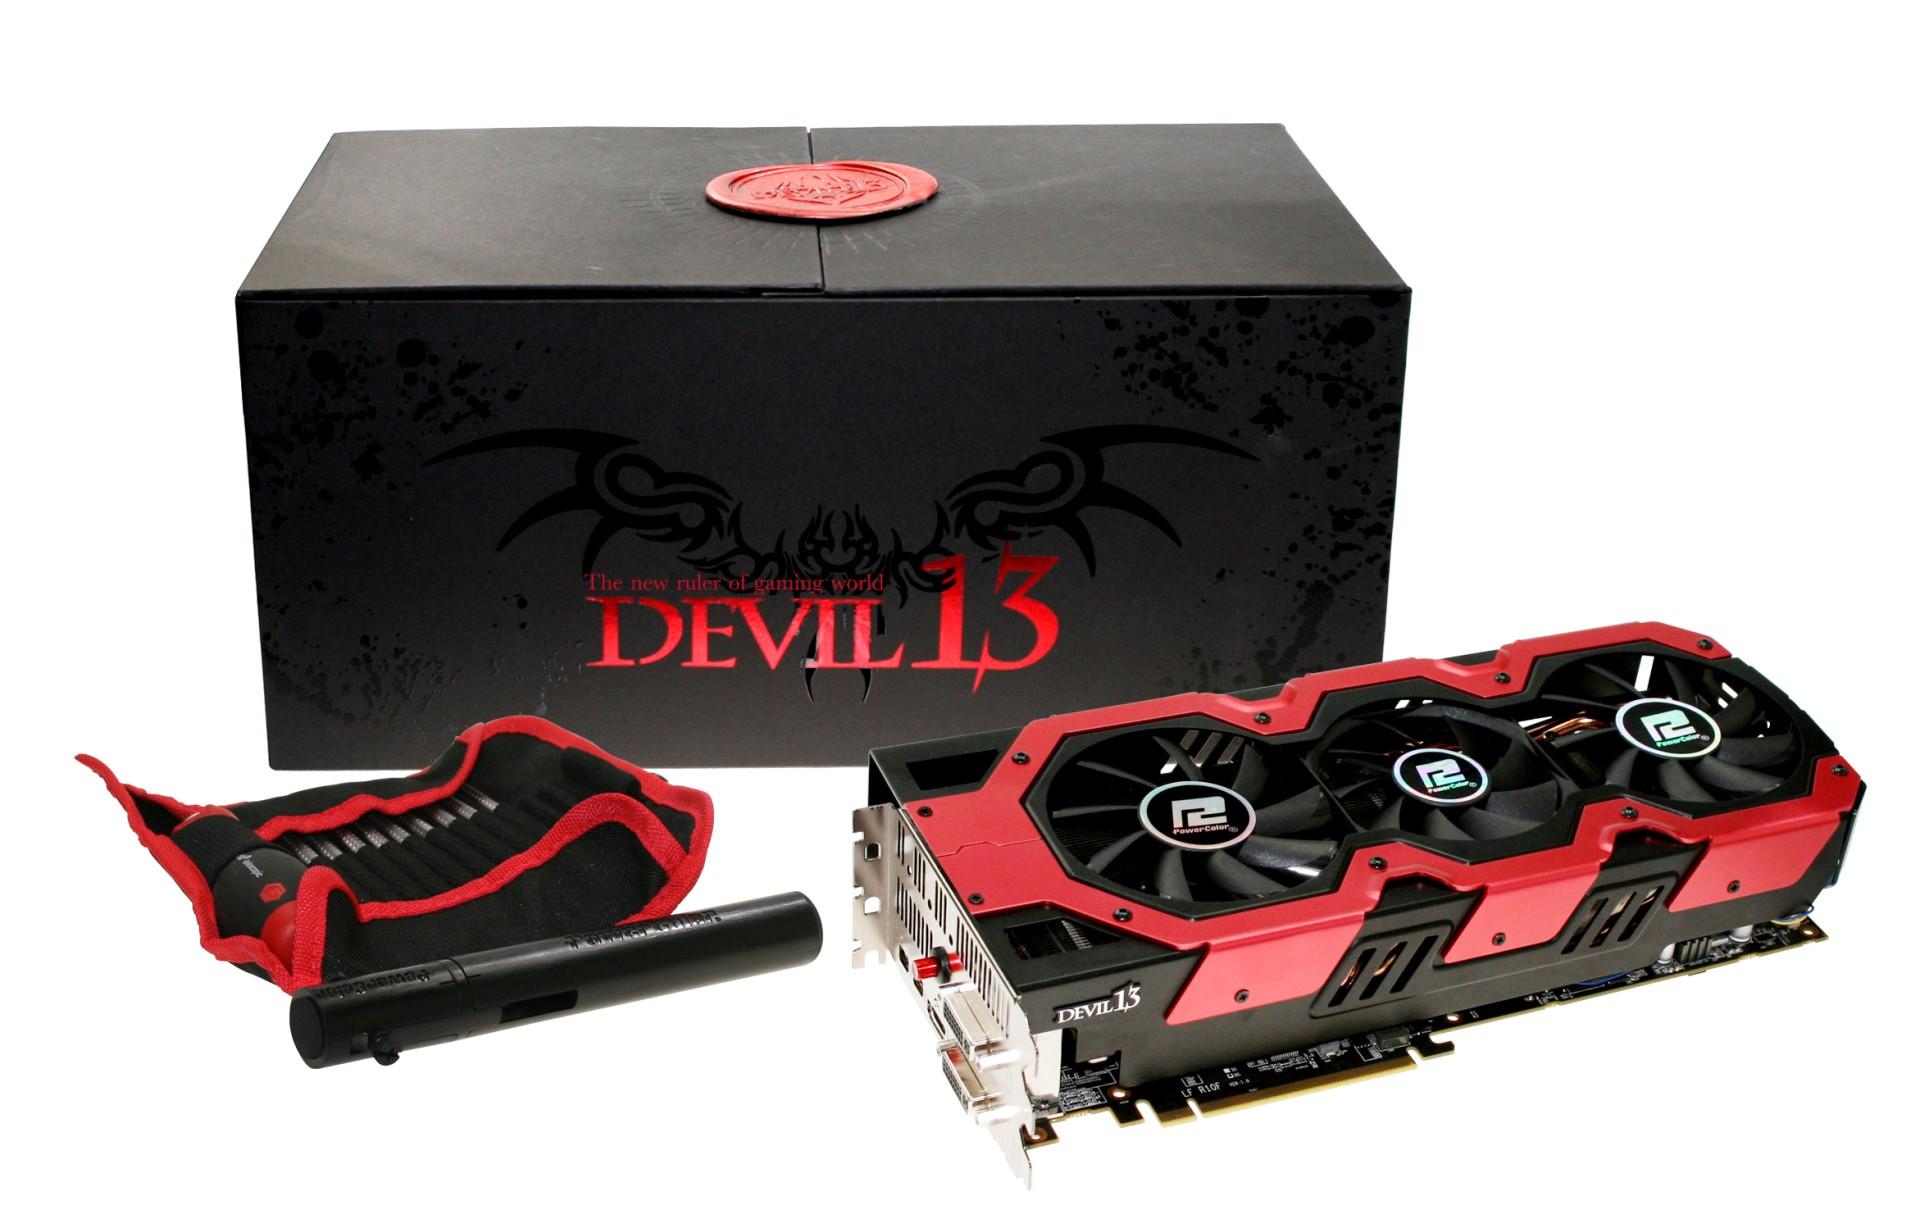 Powercolor Devil 13 HD7990: Grafikkarte mit zwei Tahiti-XT-GPUs bald erhältlich - Nett verpackt: Powercolor Devil 13 HD7990 (Bild: Hersteller)